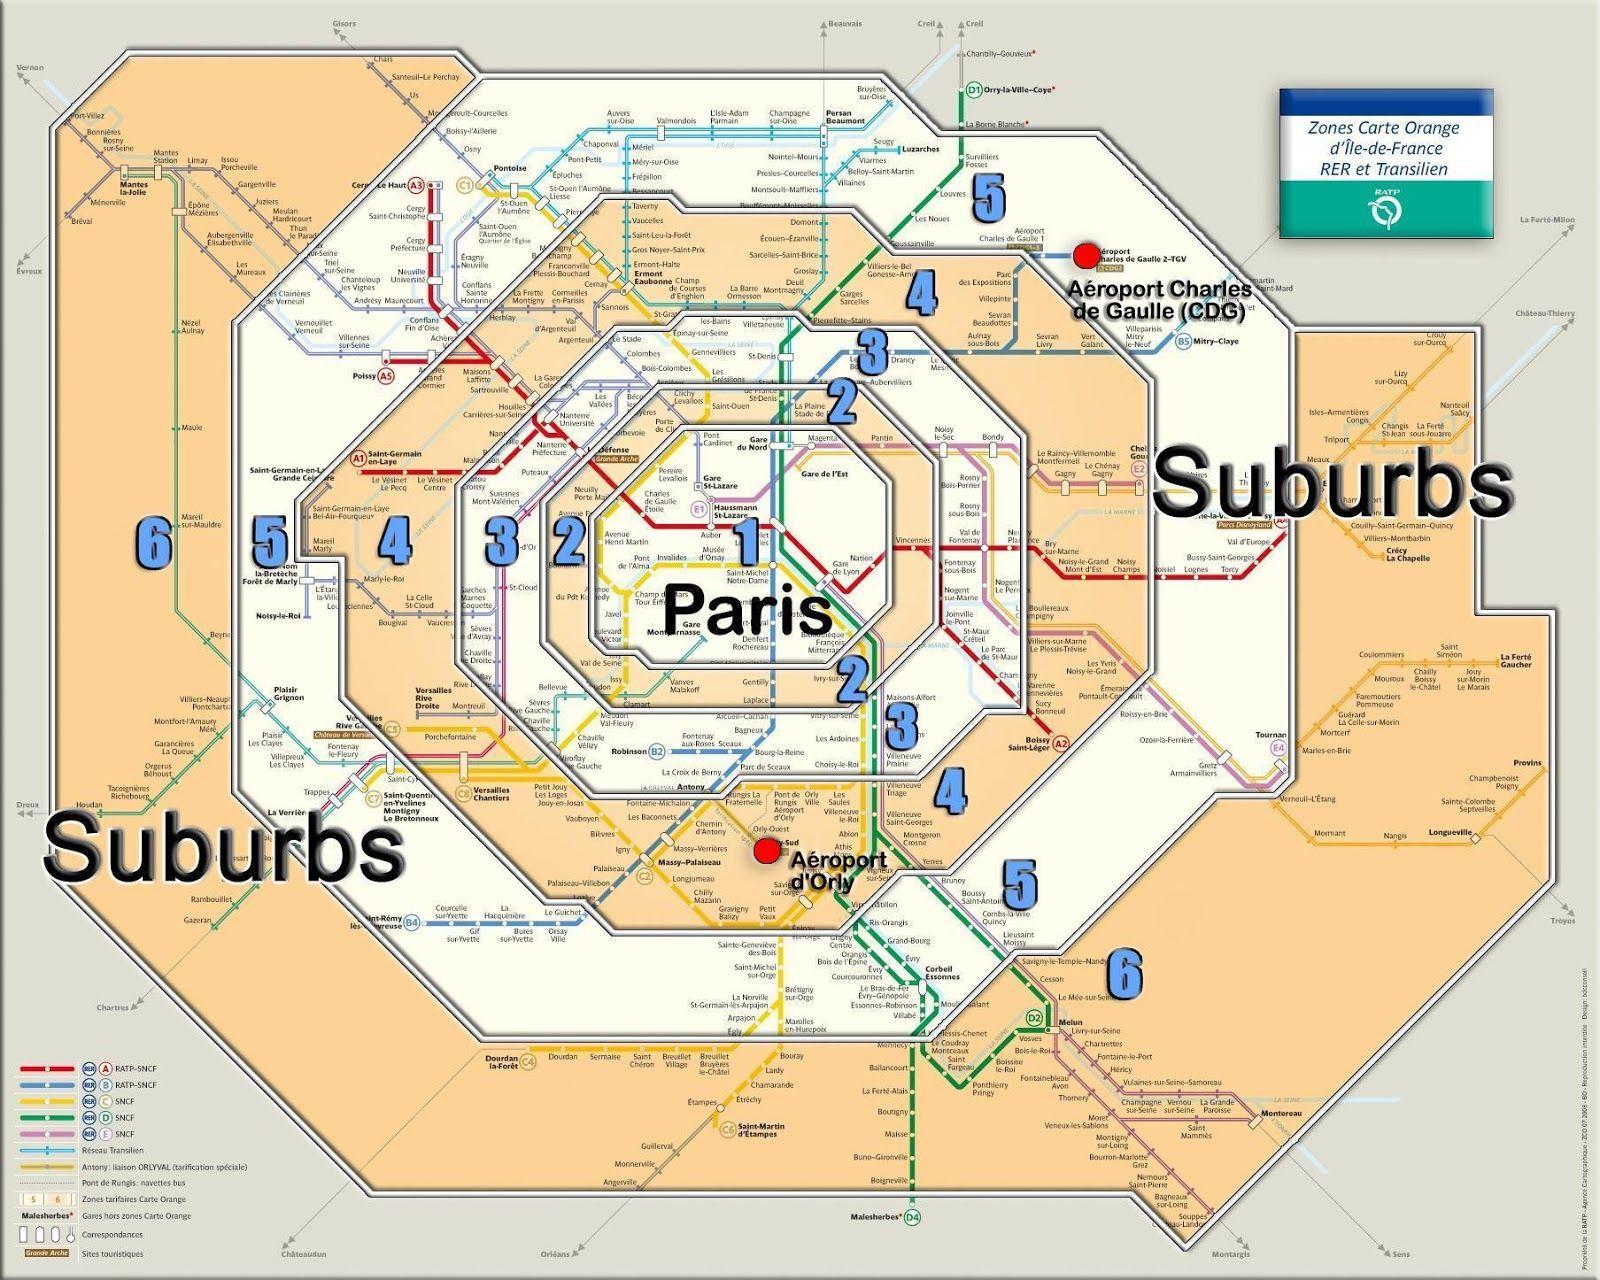 Paris Metro Zones  Art and Architecture tour  Pinterest  Paris